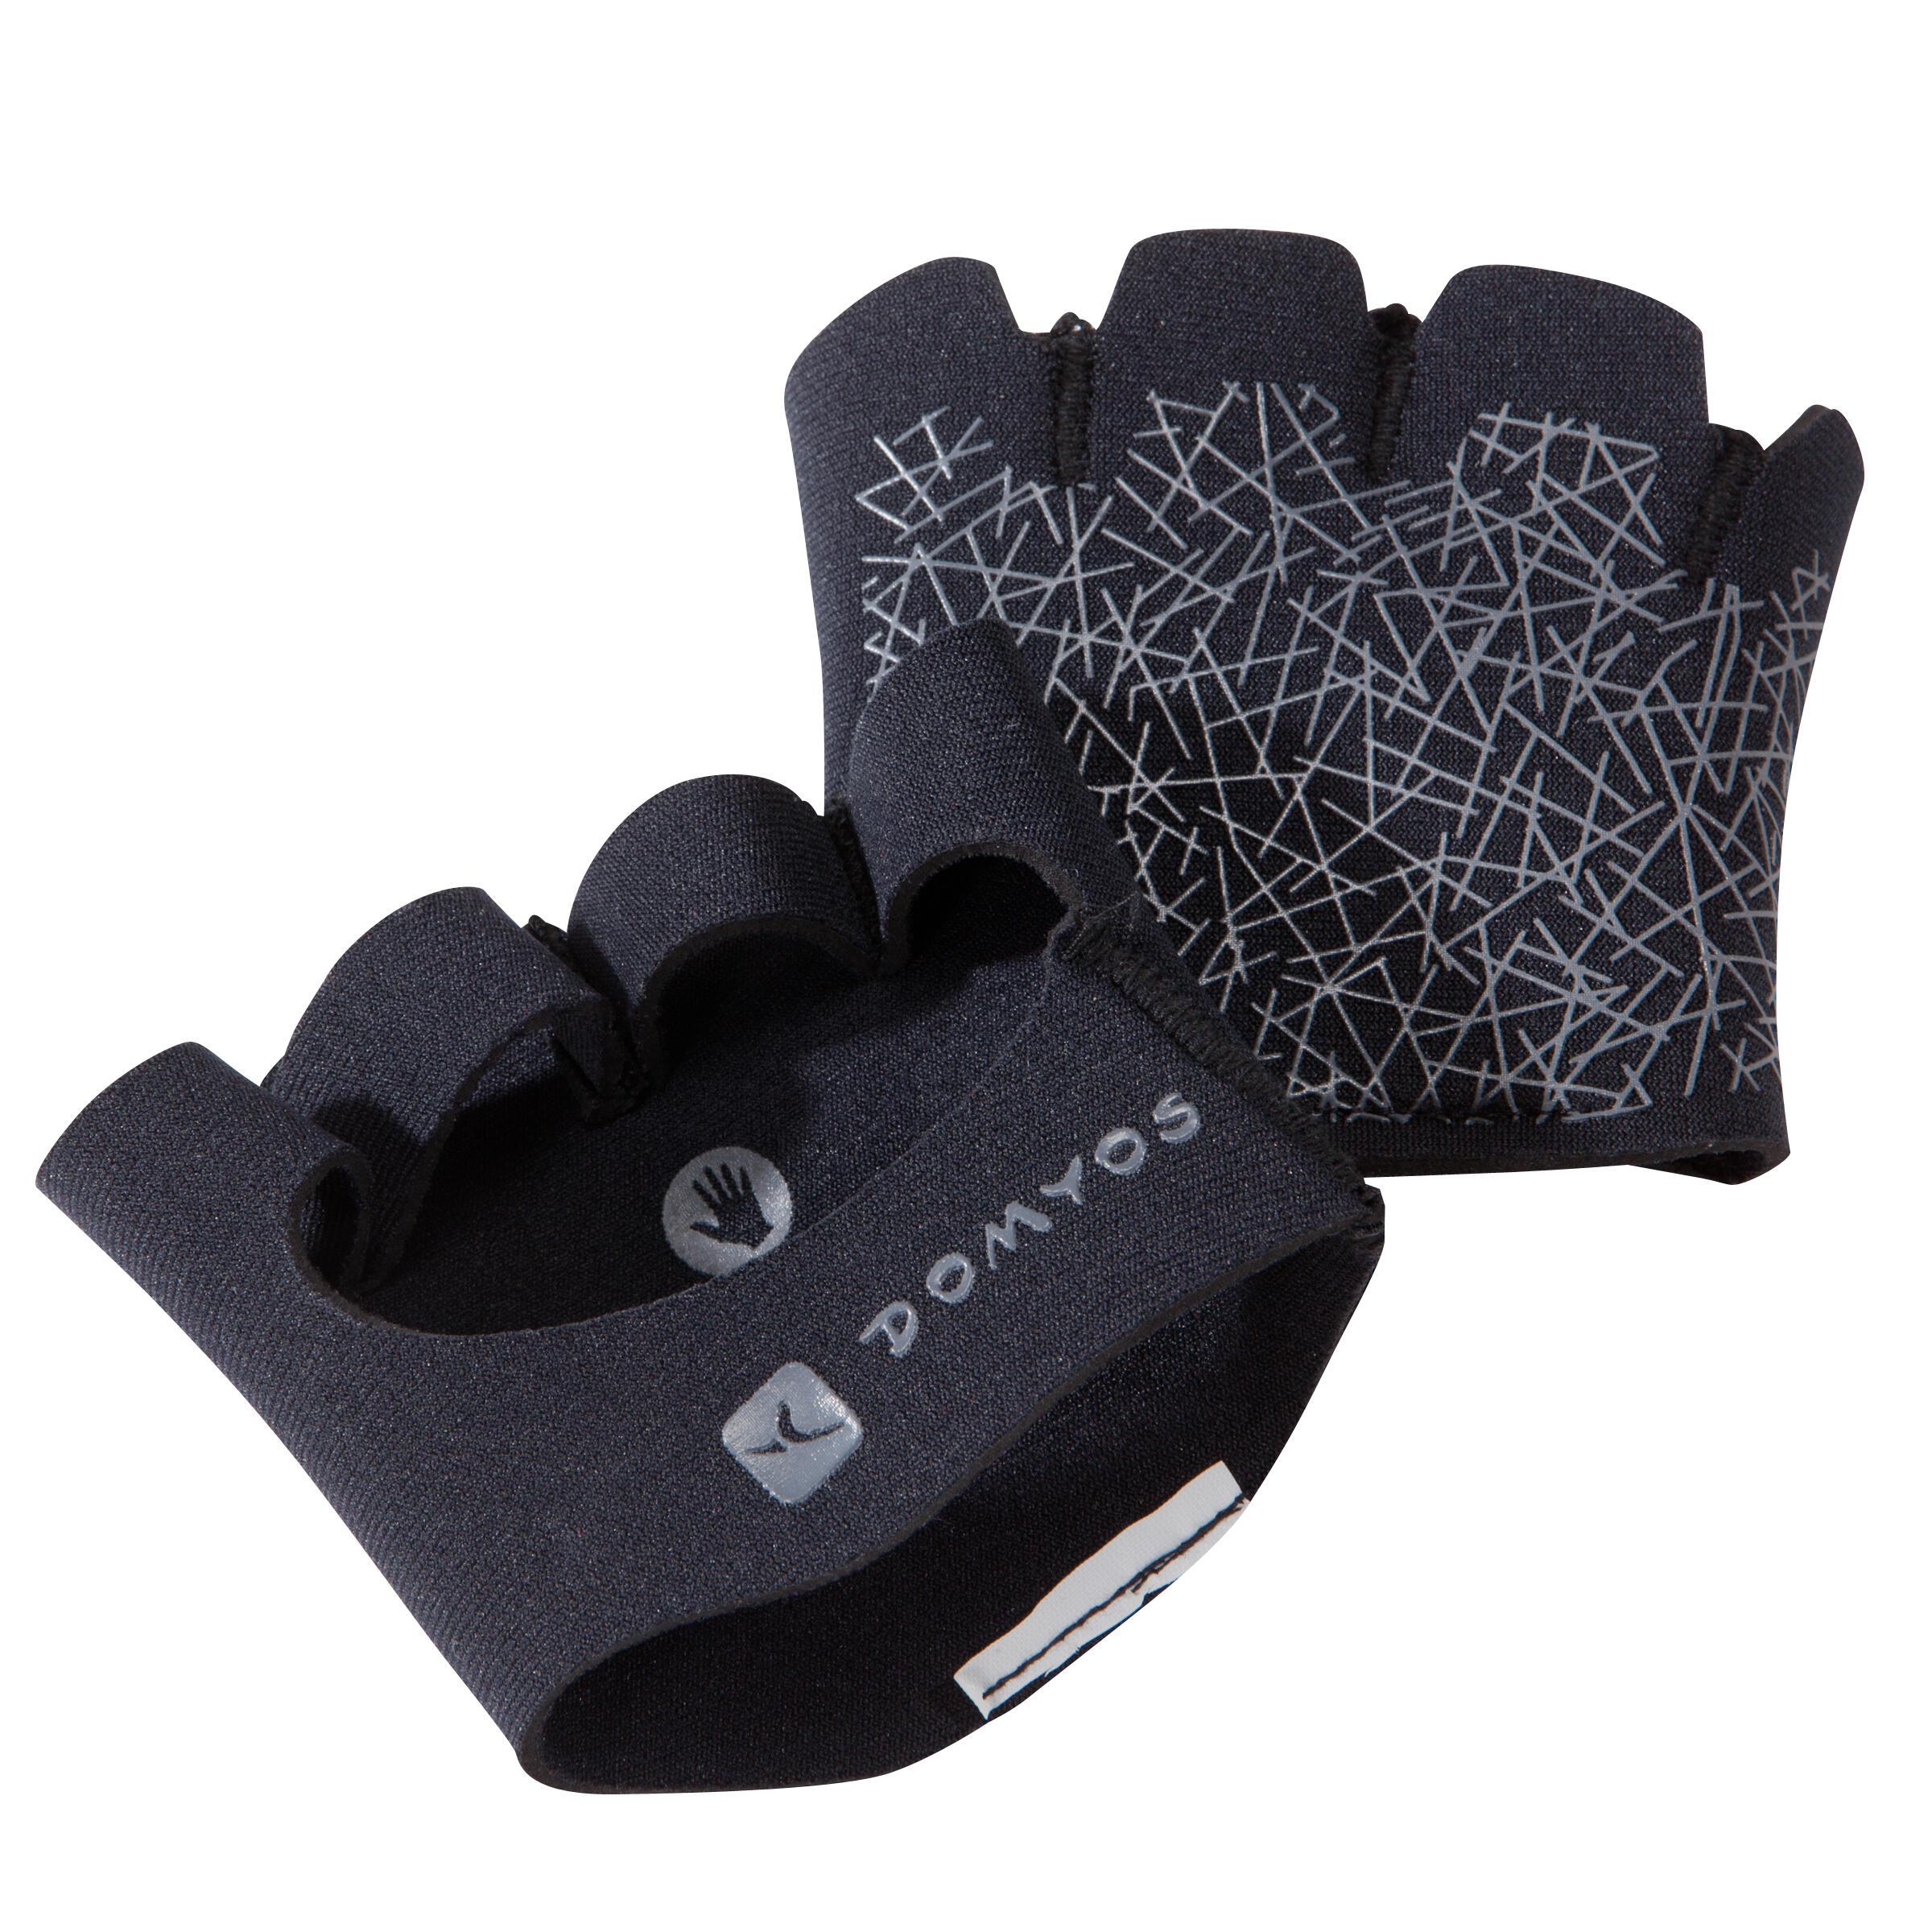 Domyos Trainingshandschoenen Grip pad Training zwart